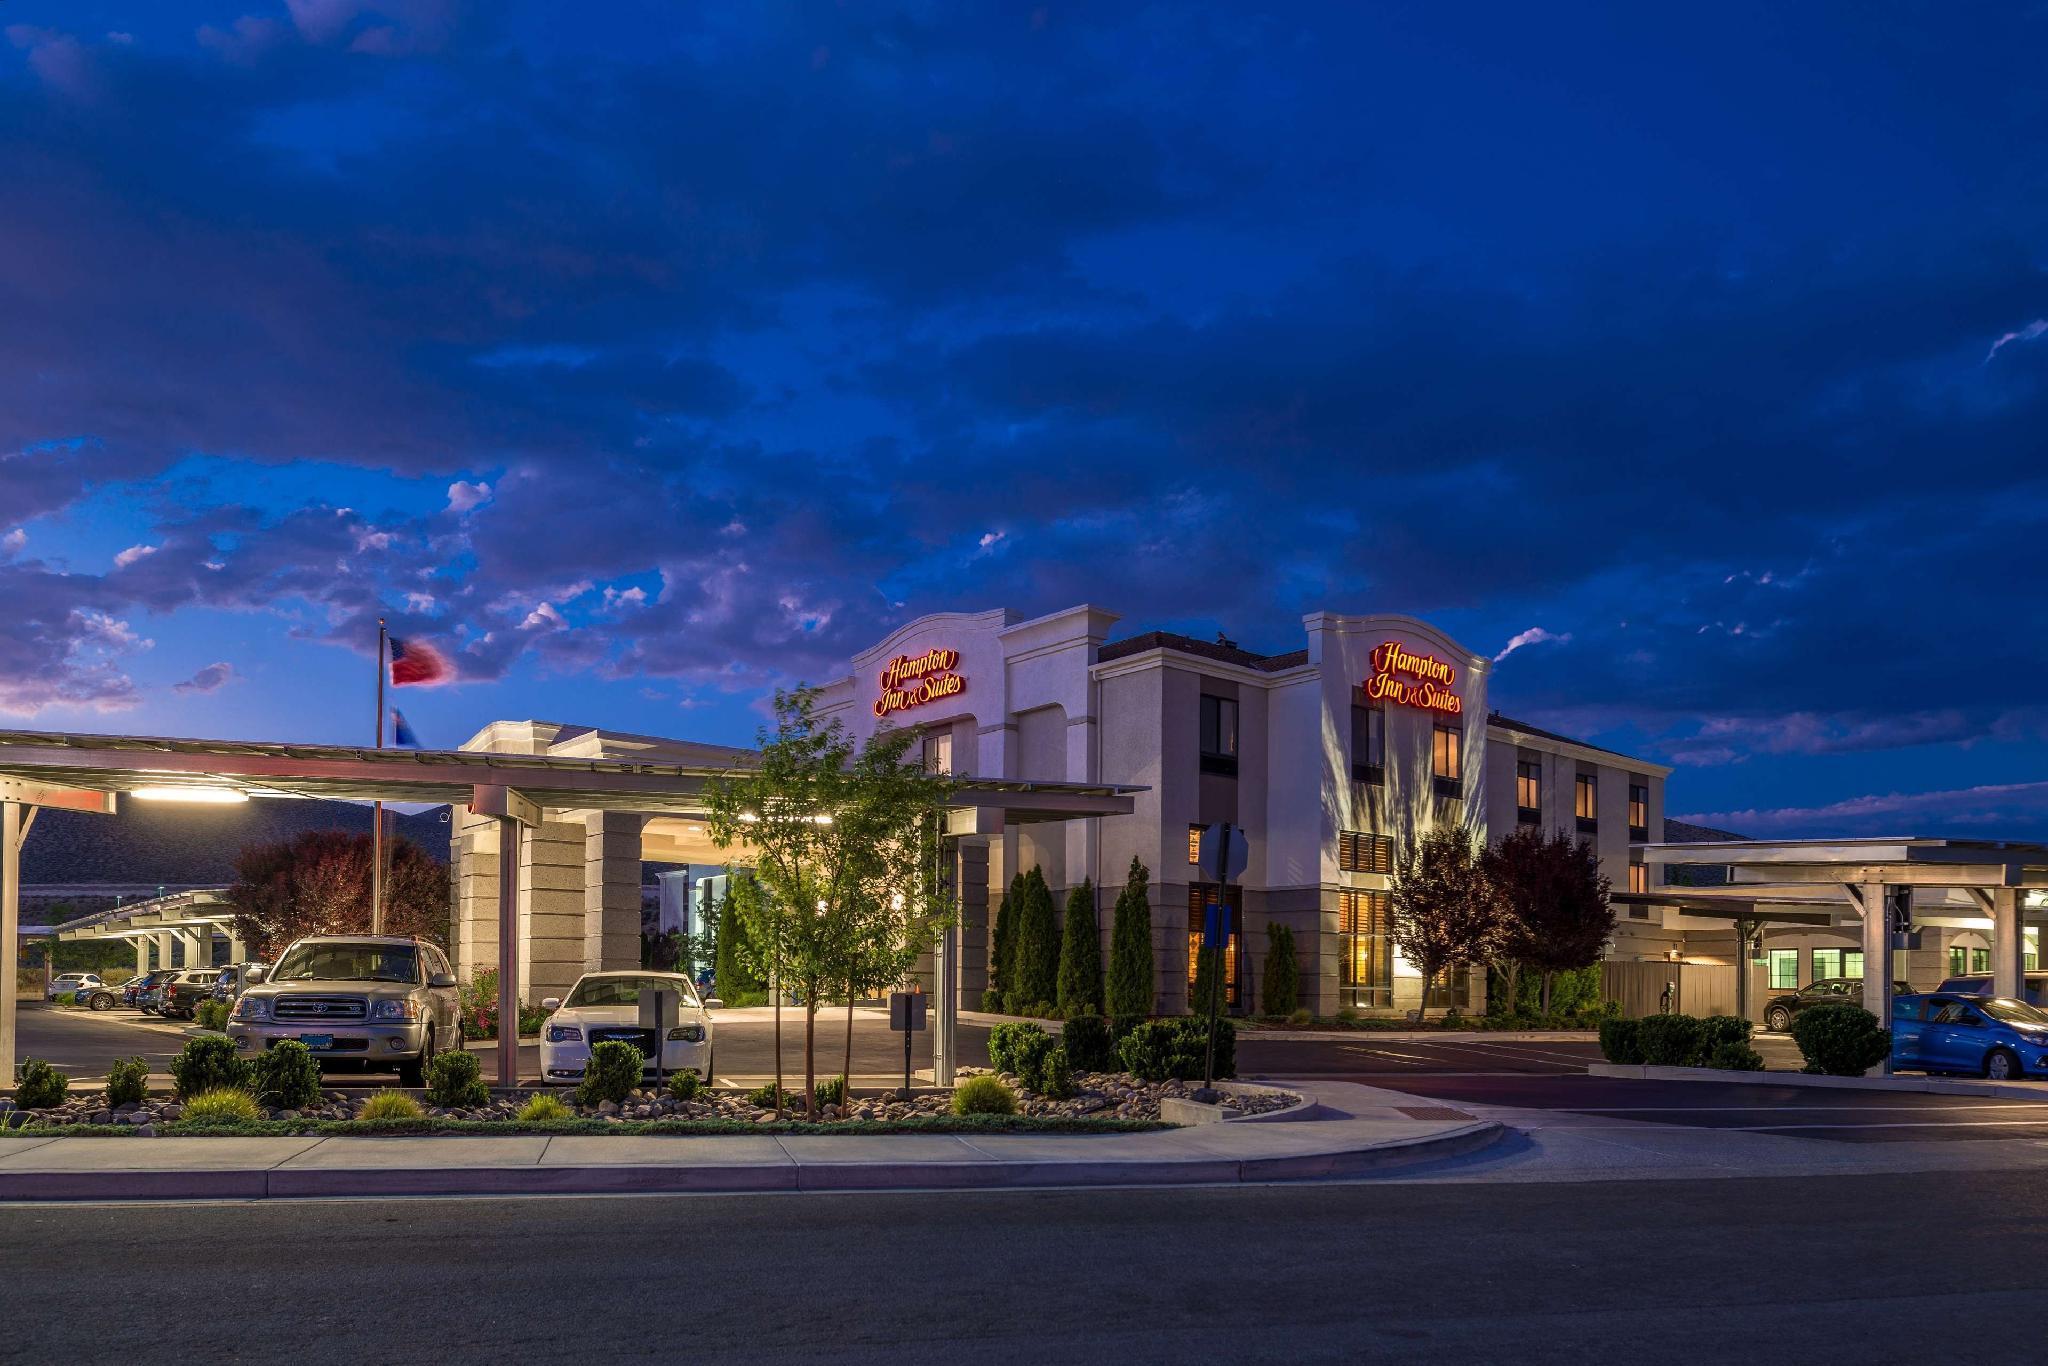 Hampton Inn And Suites Carson City